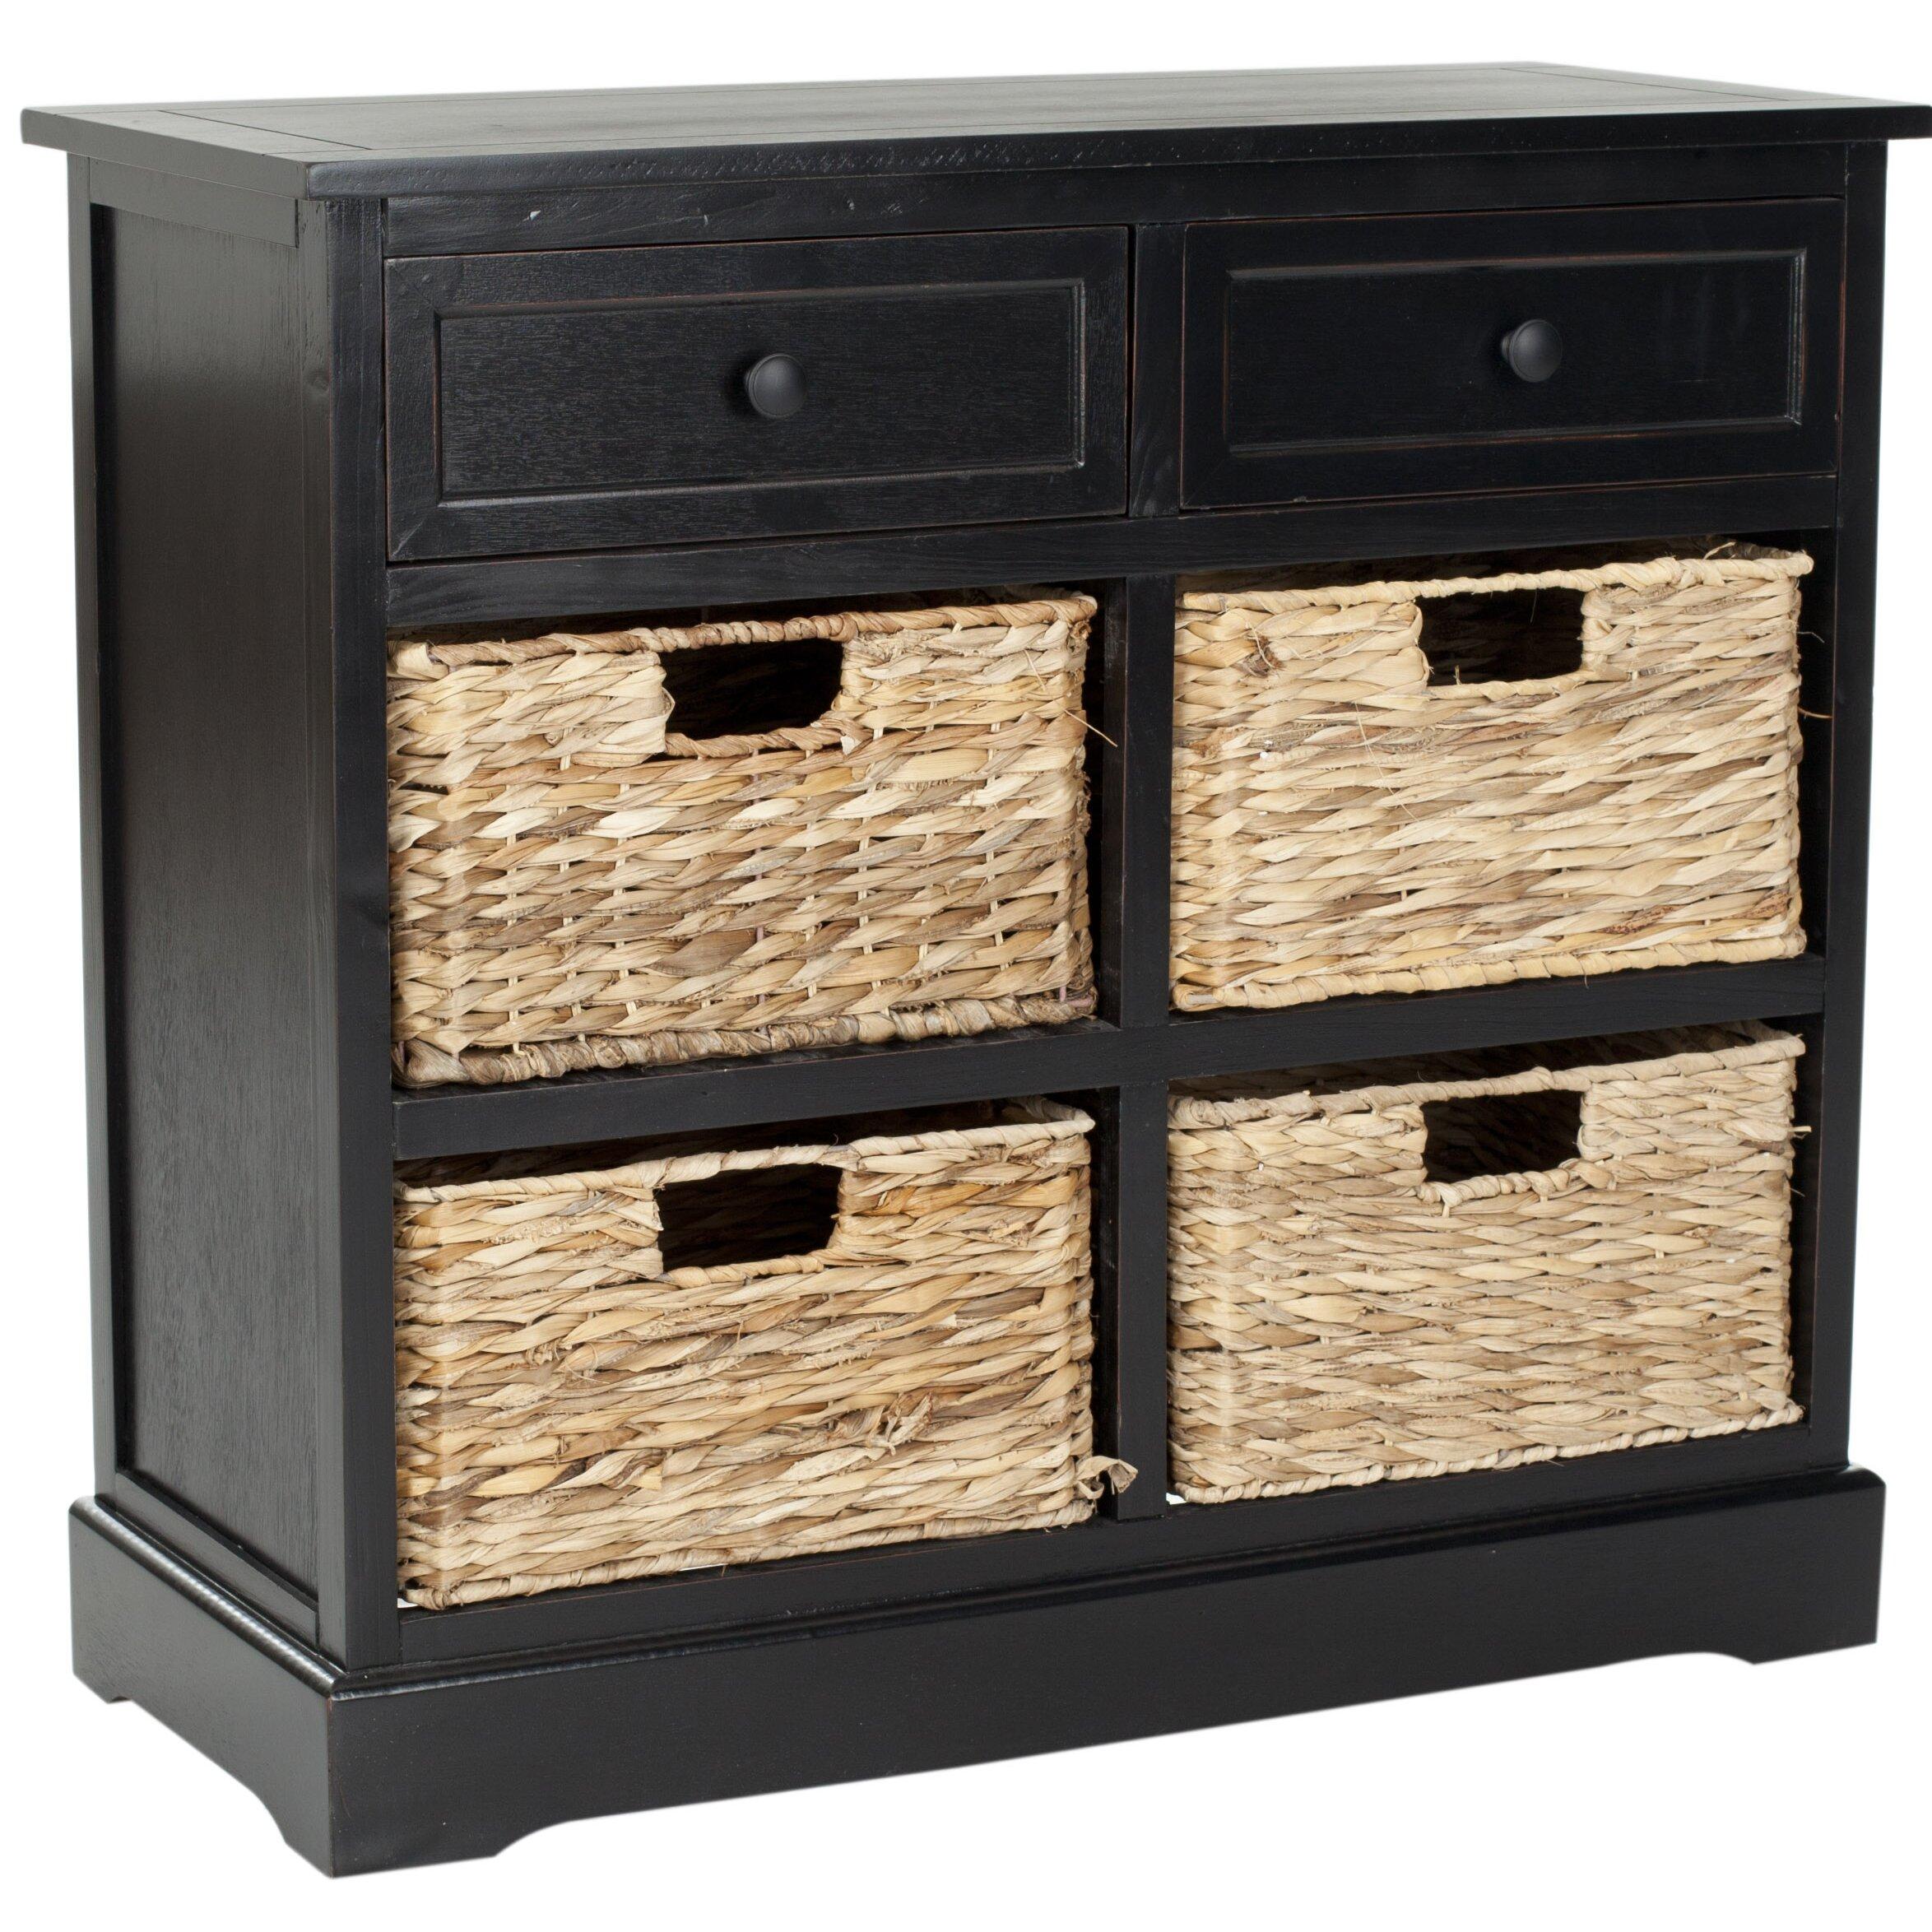 breakwater bay renley 2 drawer chest reviews wayfair. Black Bedroom Furniture Sets. Home Design Ideas